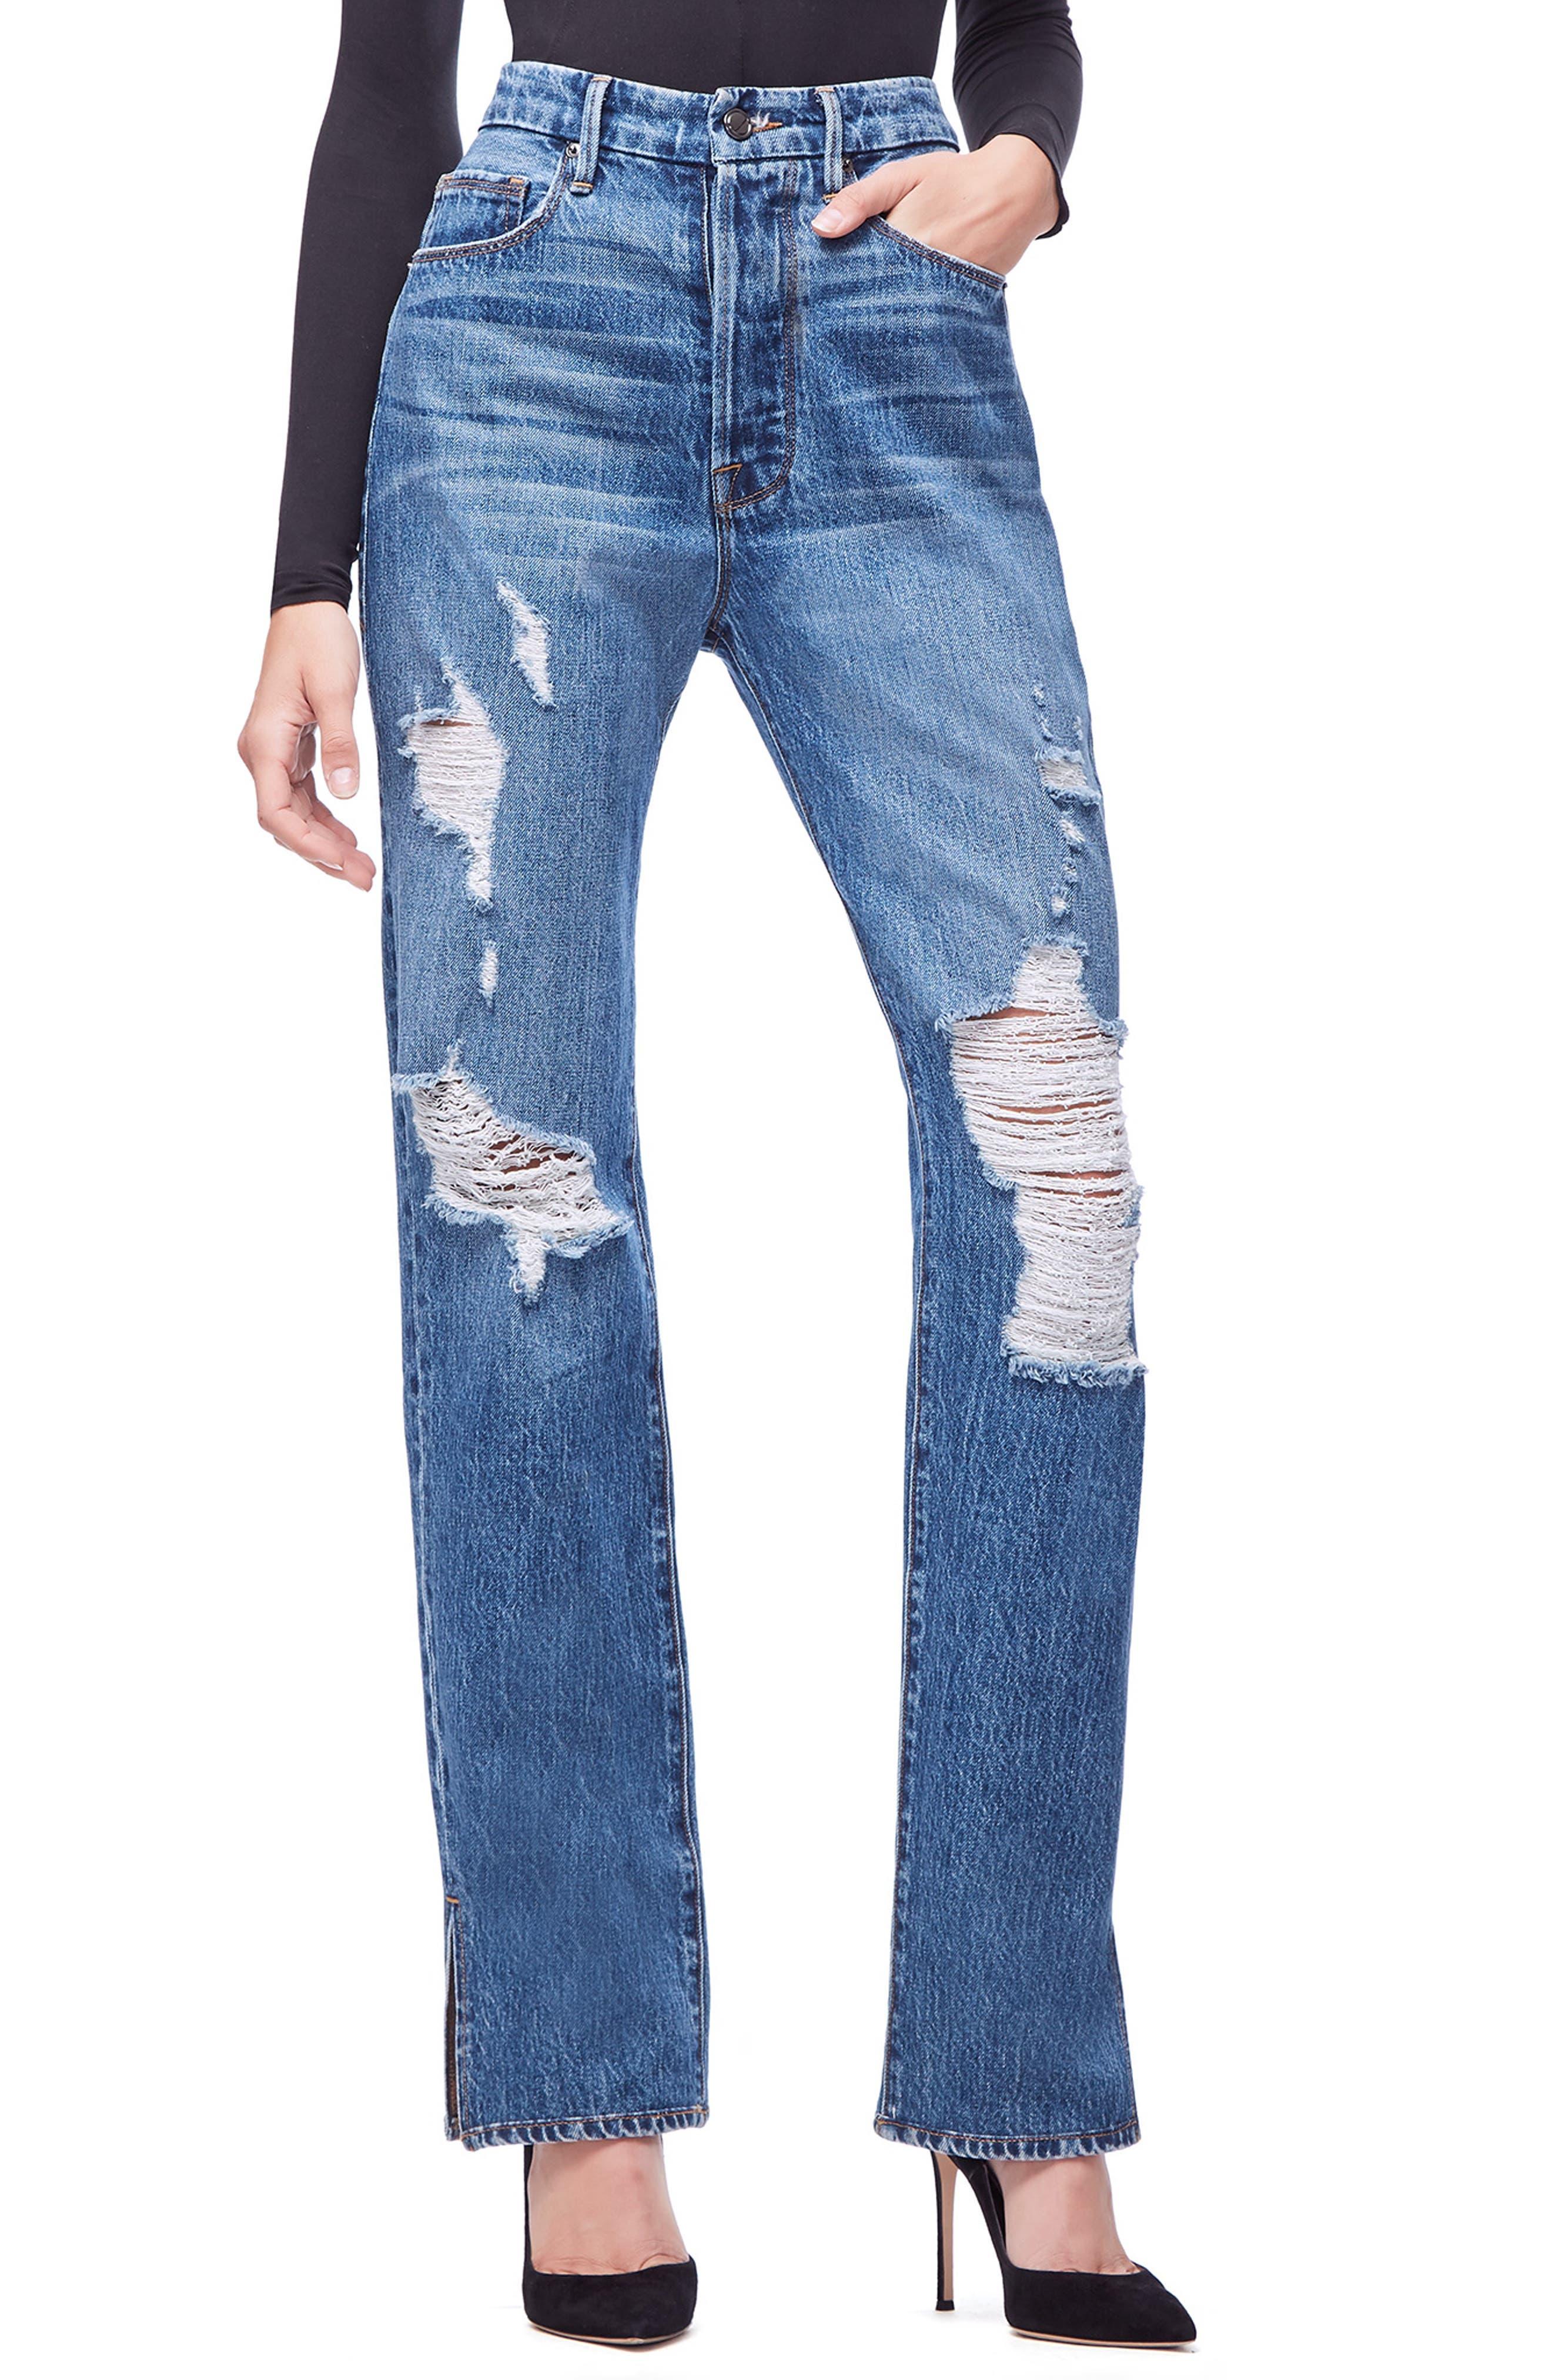 GOOD AMERICAN, Good Boy High Rise Ripped Boyfriend Jeans, Main thumbnail 1, color, BLUE194